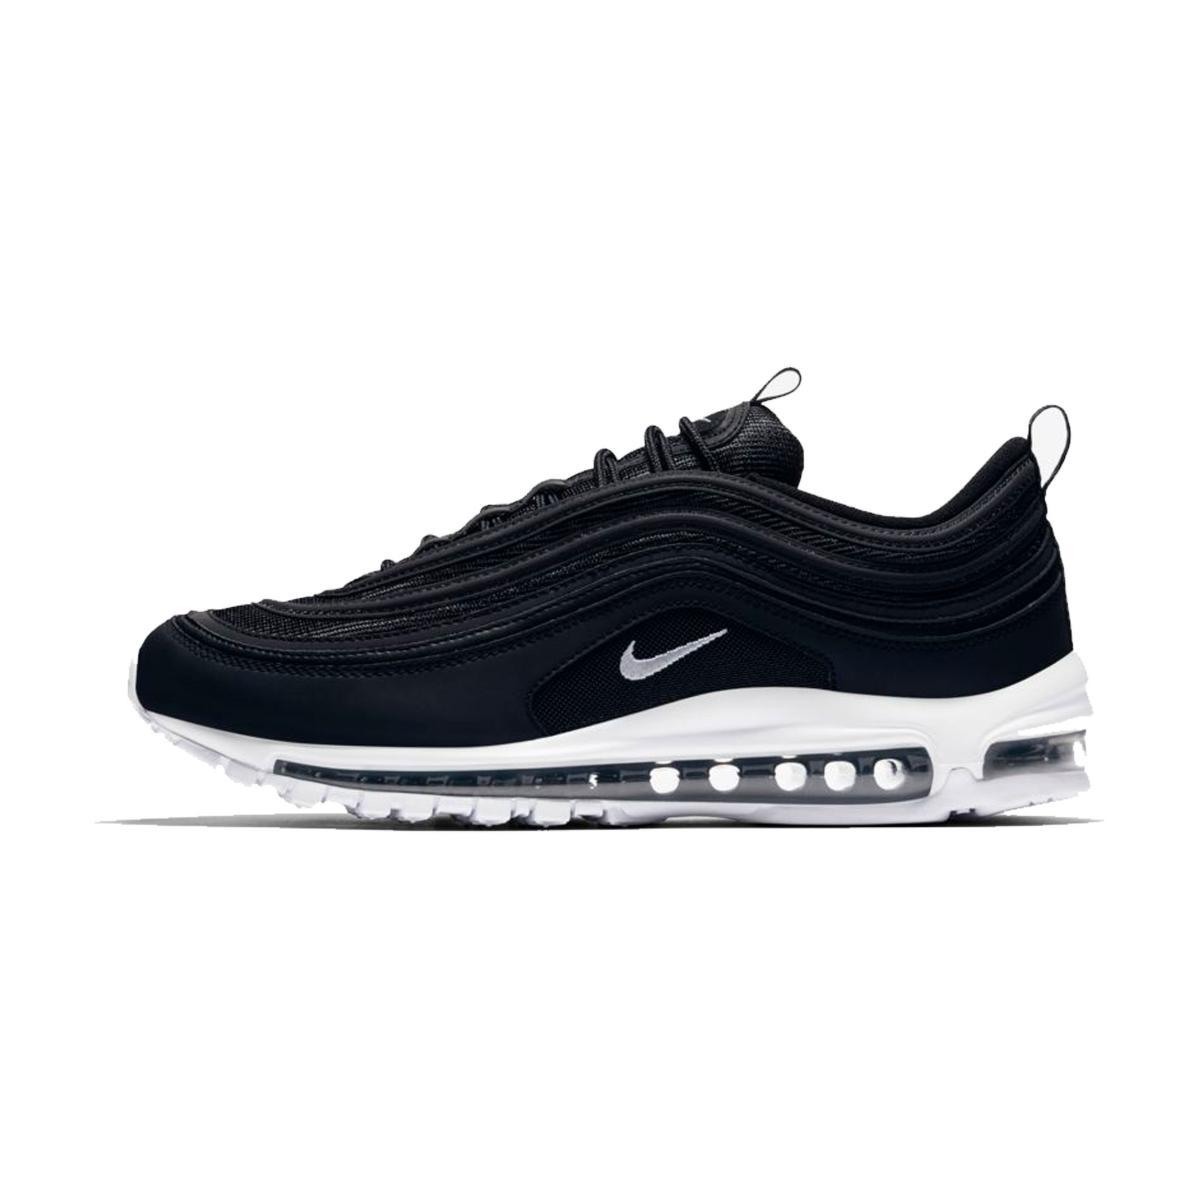 Scarpe Sneakers Nike Air Max 97 da uomo rif. 921826 001